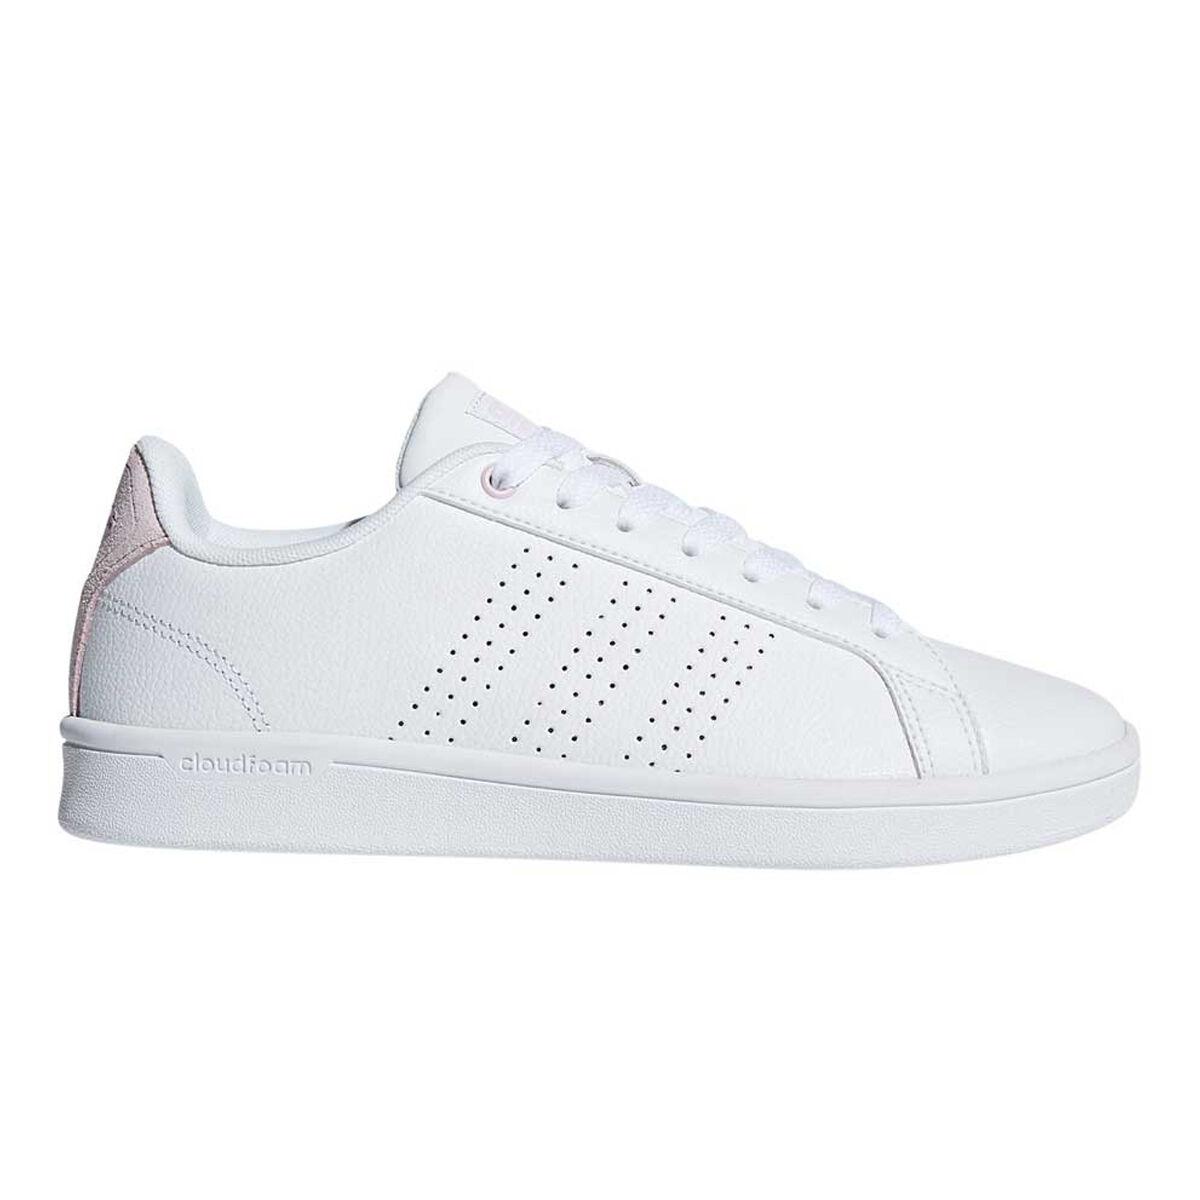 adidas Cloudfoam Advantage Womens Casual Shoes Pink White US 6